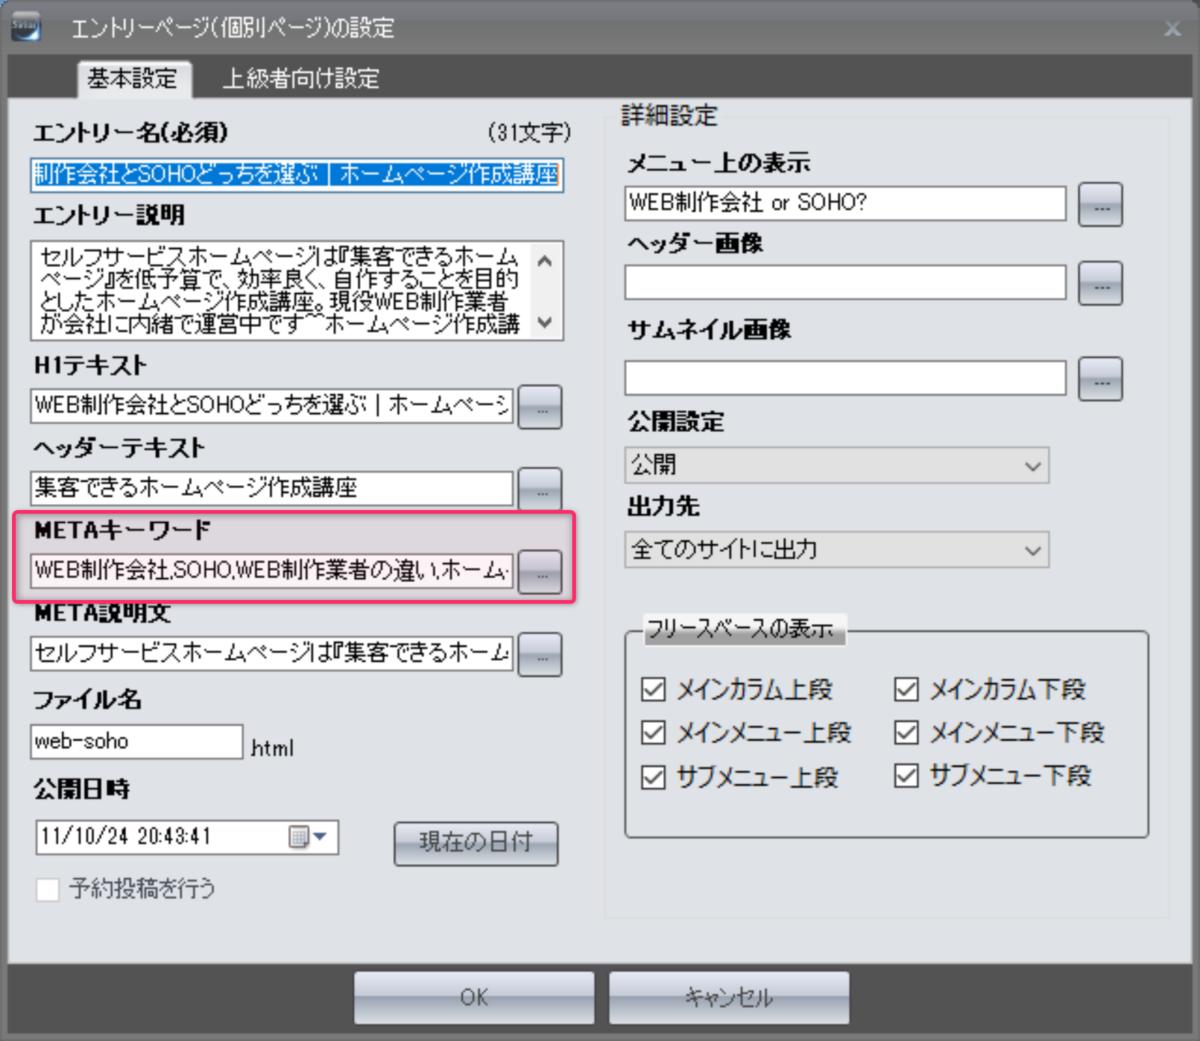 SIRIUSサイト エントリーページ(個別ページ)の設定のMETAキーワードは、個別記事のMETA keywordとなる。